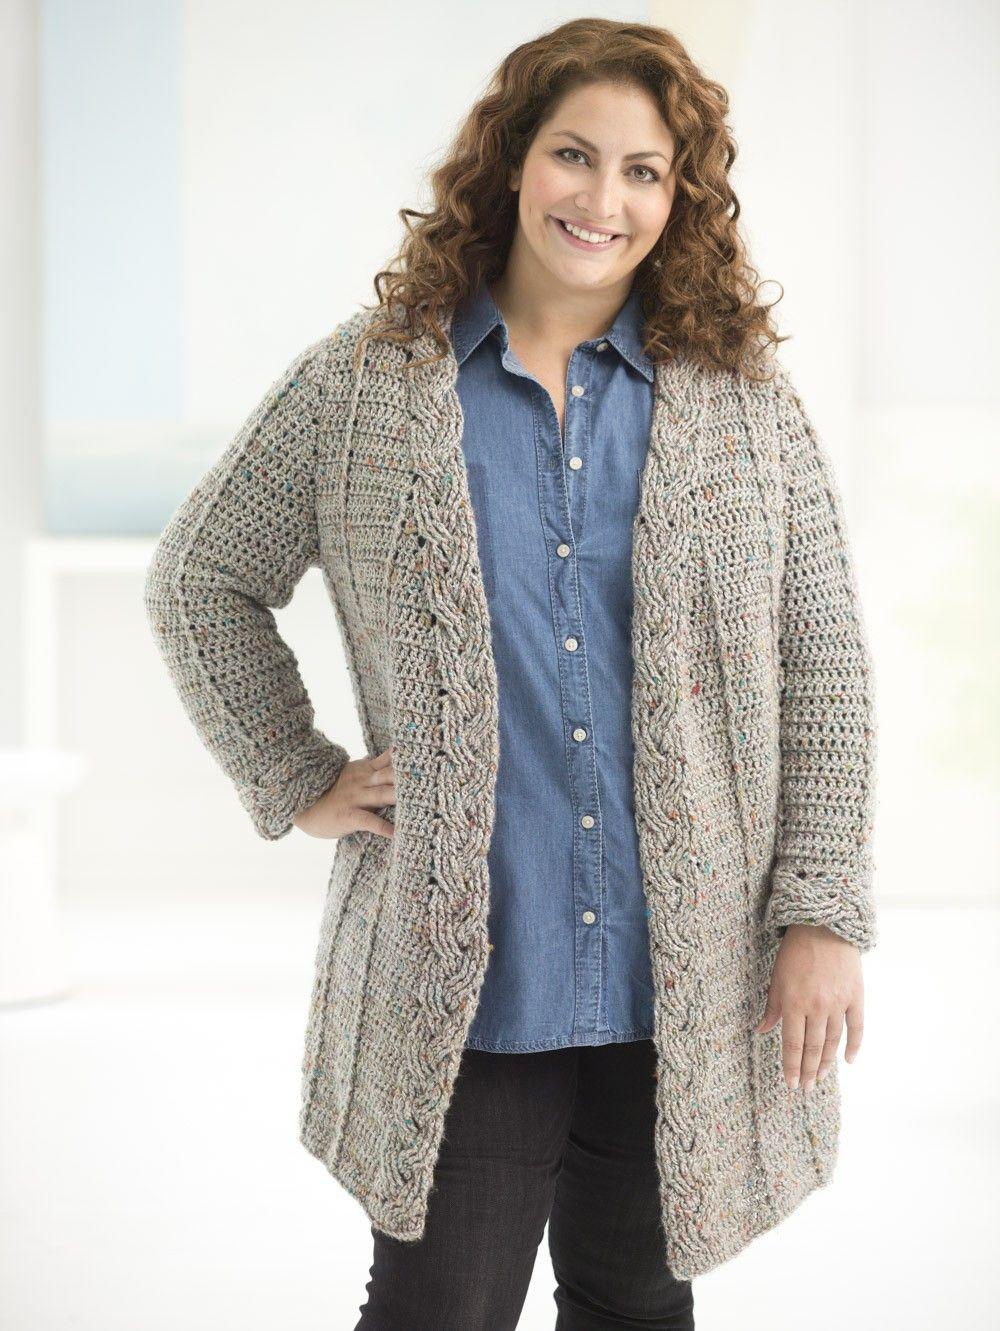 862479f934414 Curvy Girl Crochet Cabled Cardigan - Patterns - Lion Brand Yarn ...